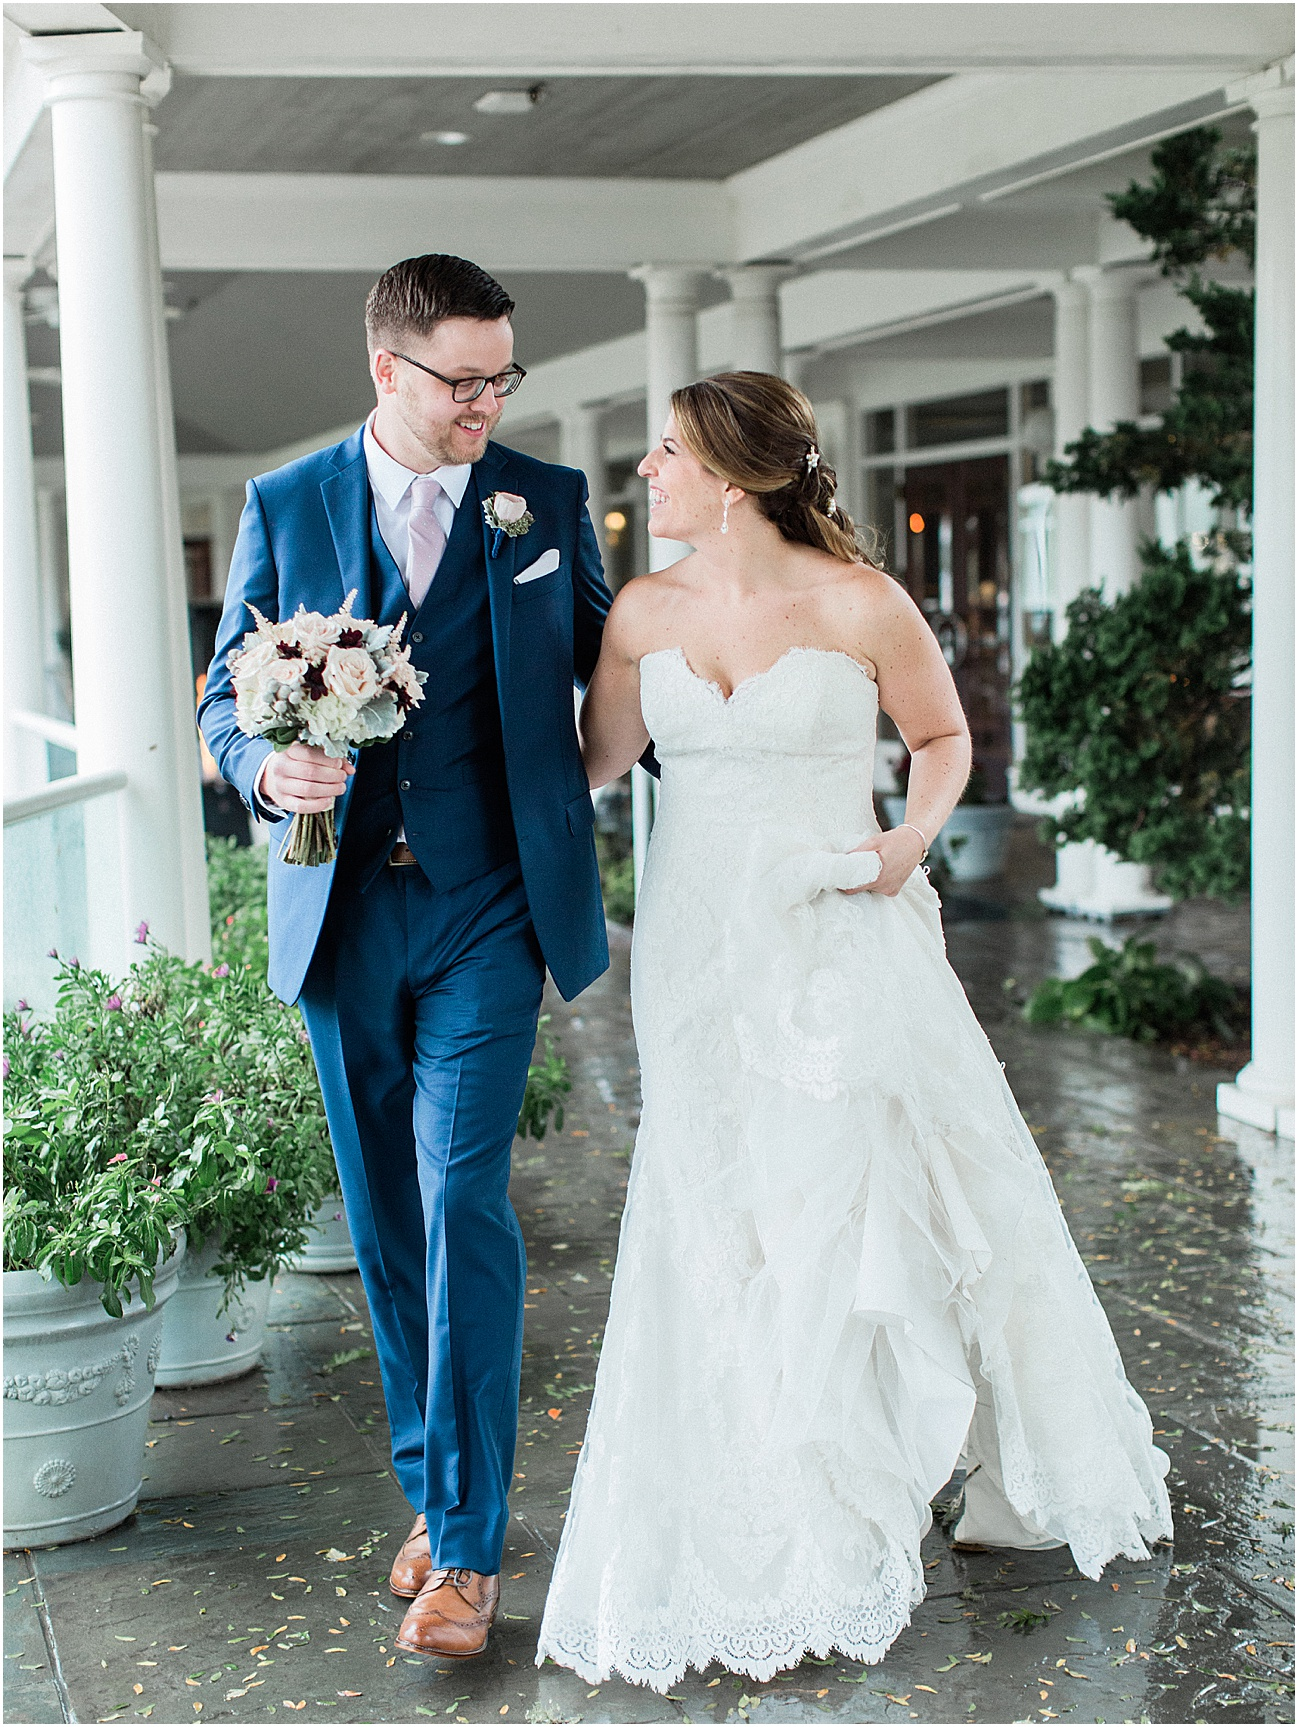 danielle_sean_willowbend_rain_rainy_day_cape_cod_boston_wedding_photographer_meredith_jane_photography_photo_1676.jpg